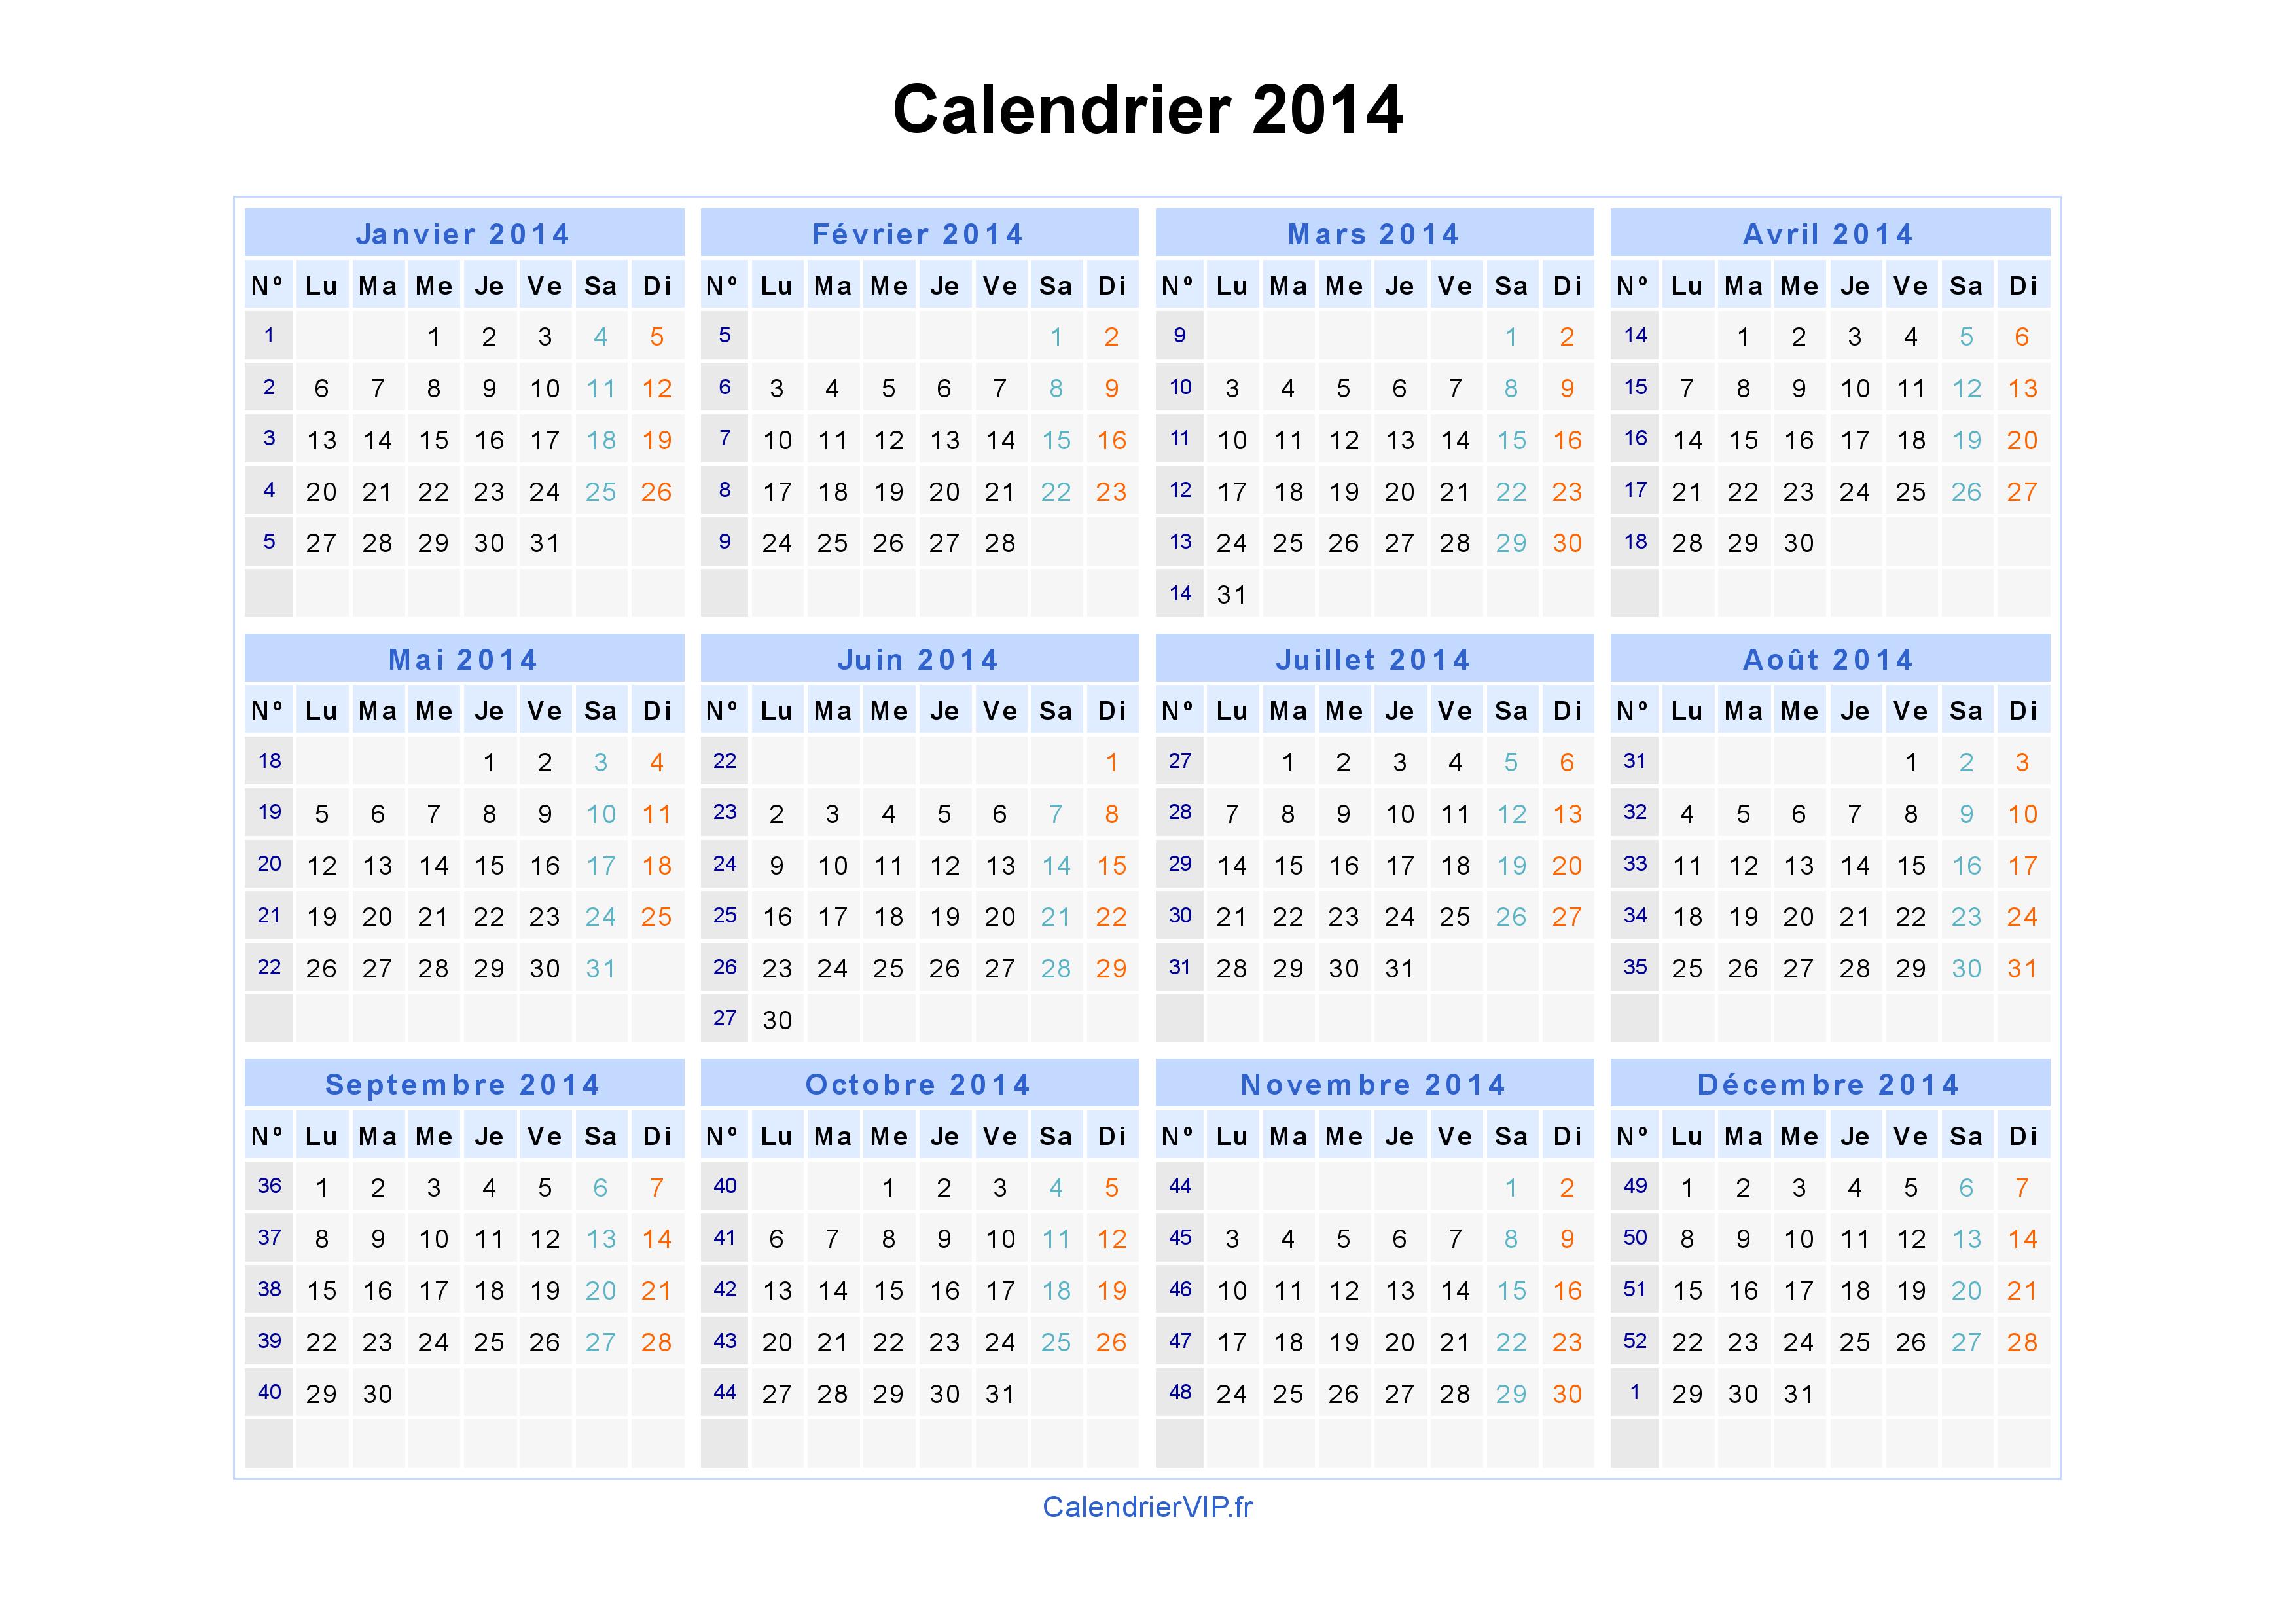 Calendrier 2015 gratuit imprimer pdf a3 new calendar for Calendrier mural gratuit